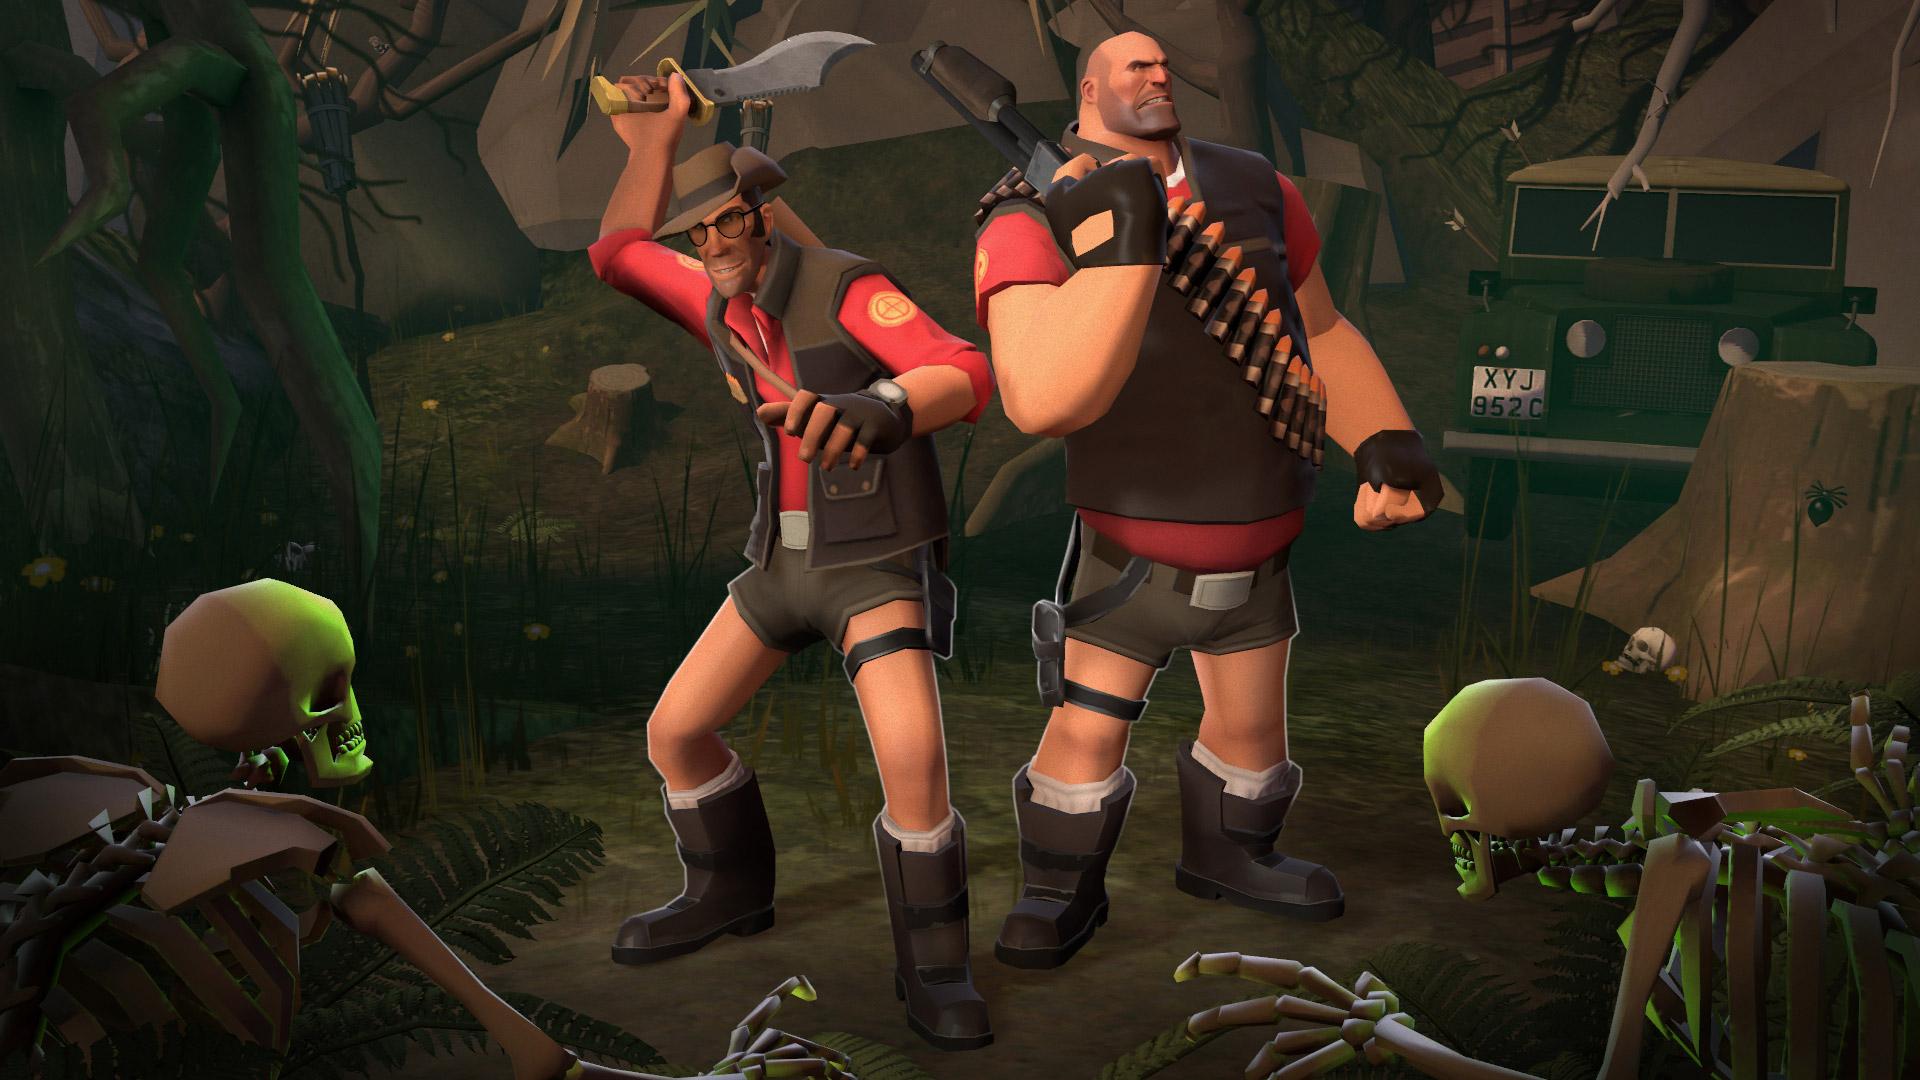 Lara Croft's short shorts are coming to Team Fortress 2